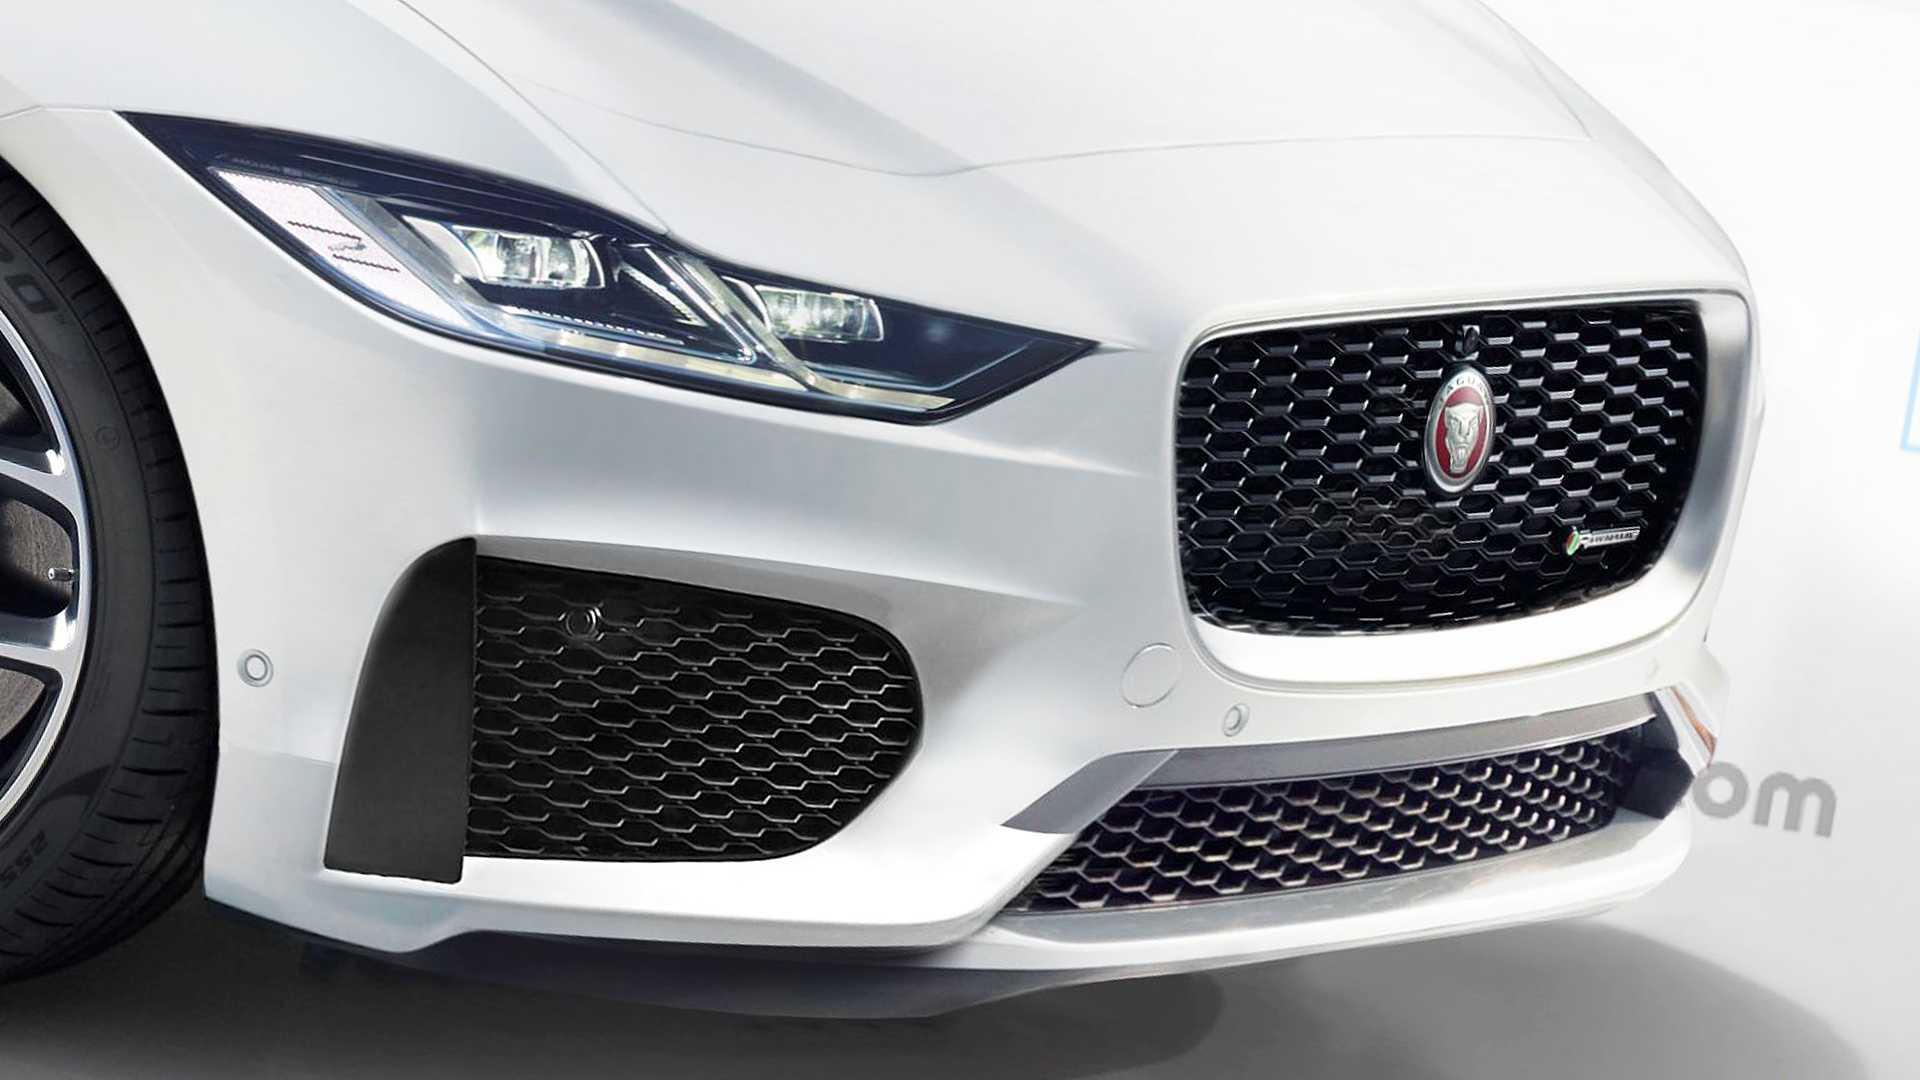 78 New 2020 Jaguar Xj Redesign Reviews for 2020 Jaguar Xj Redesign